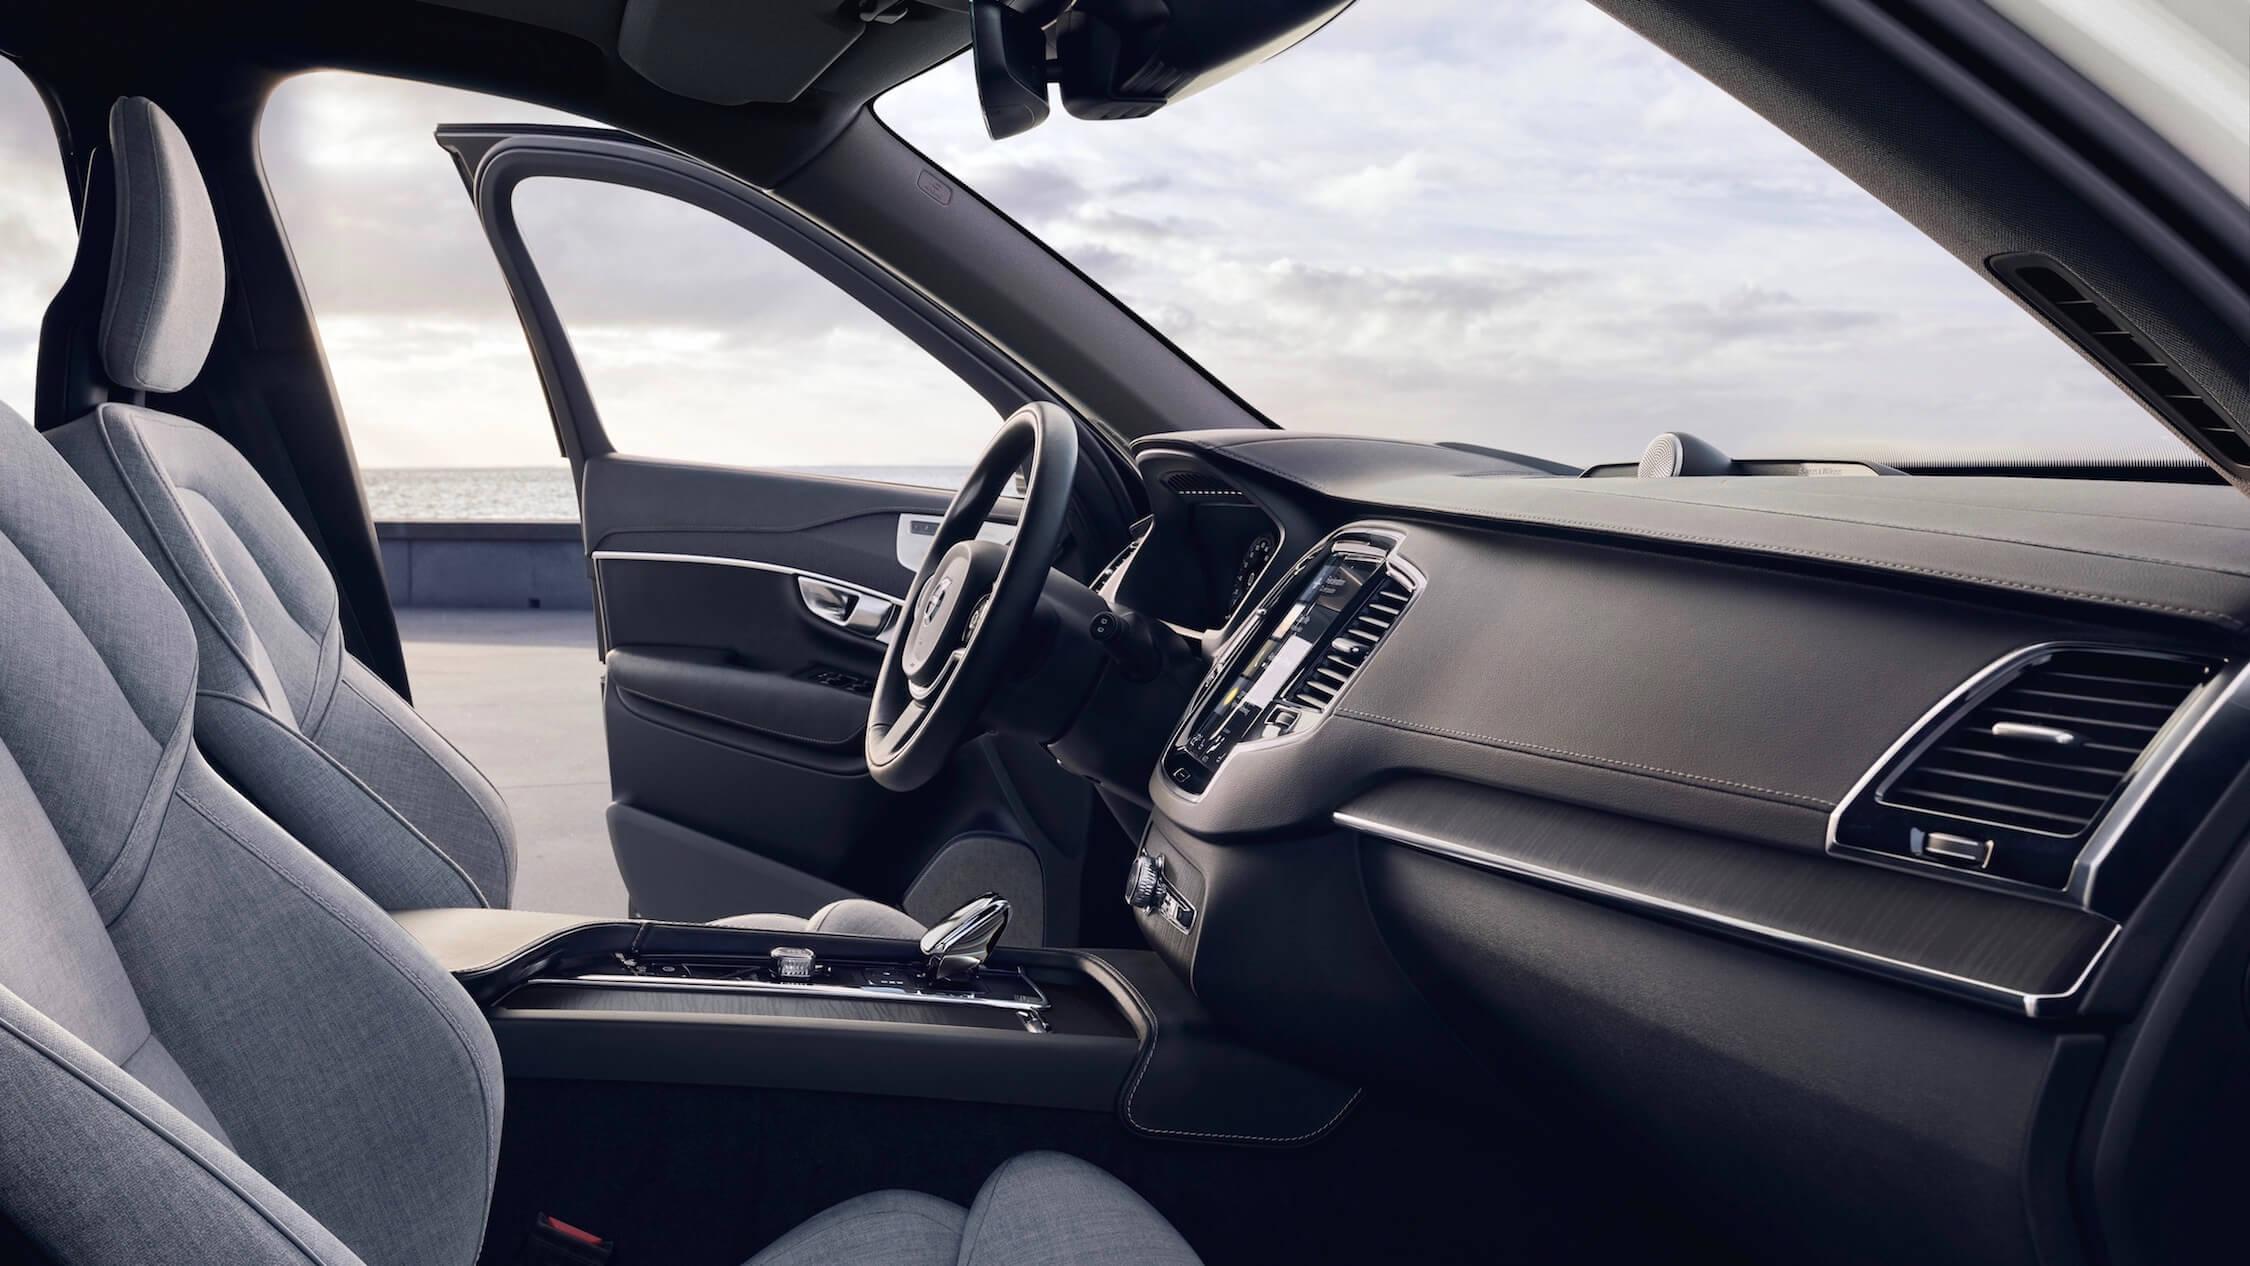 2019 Volvo XC90 interieur